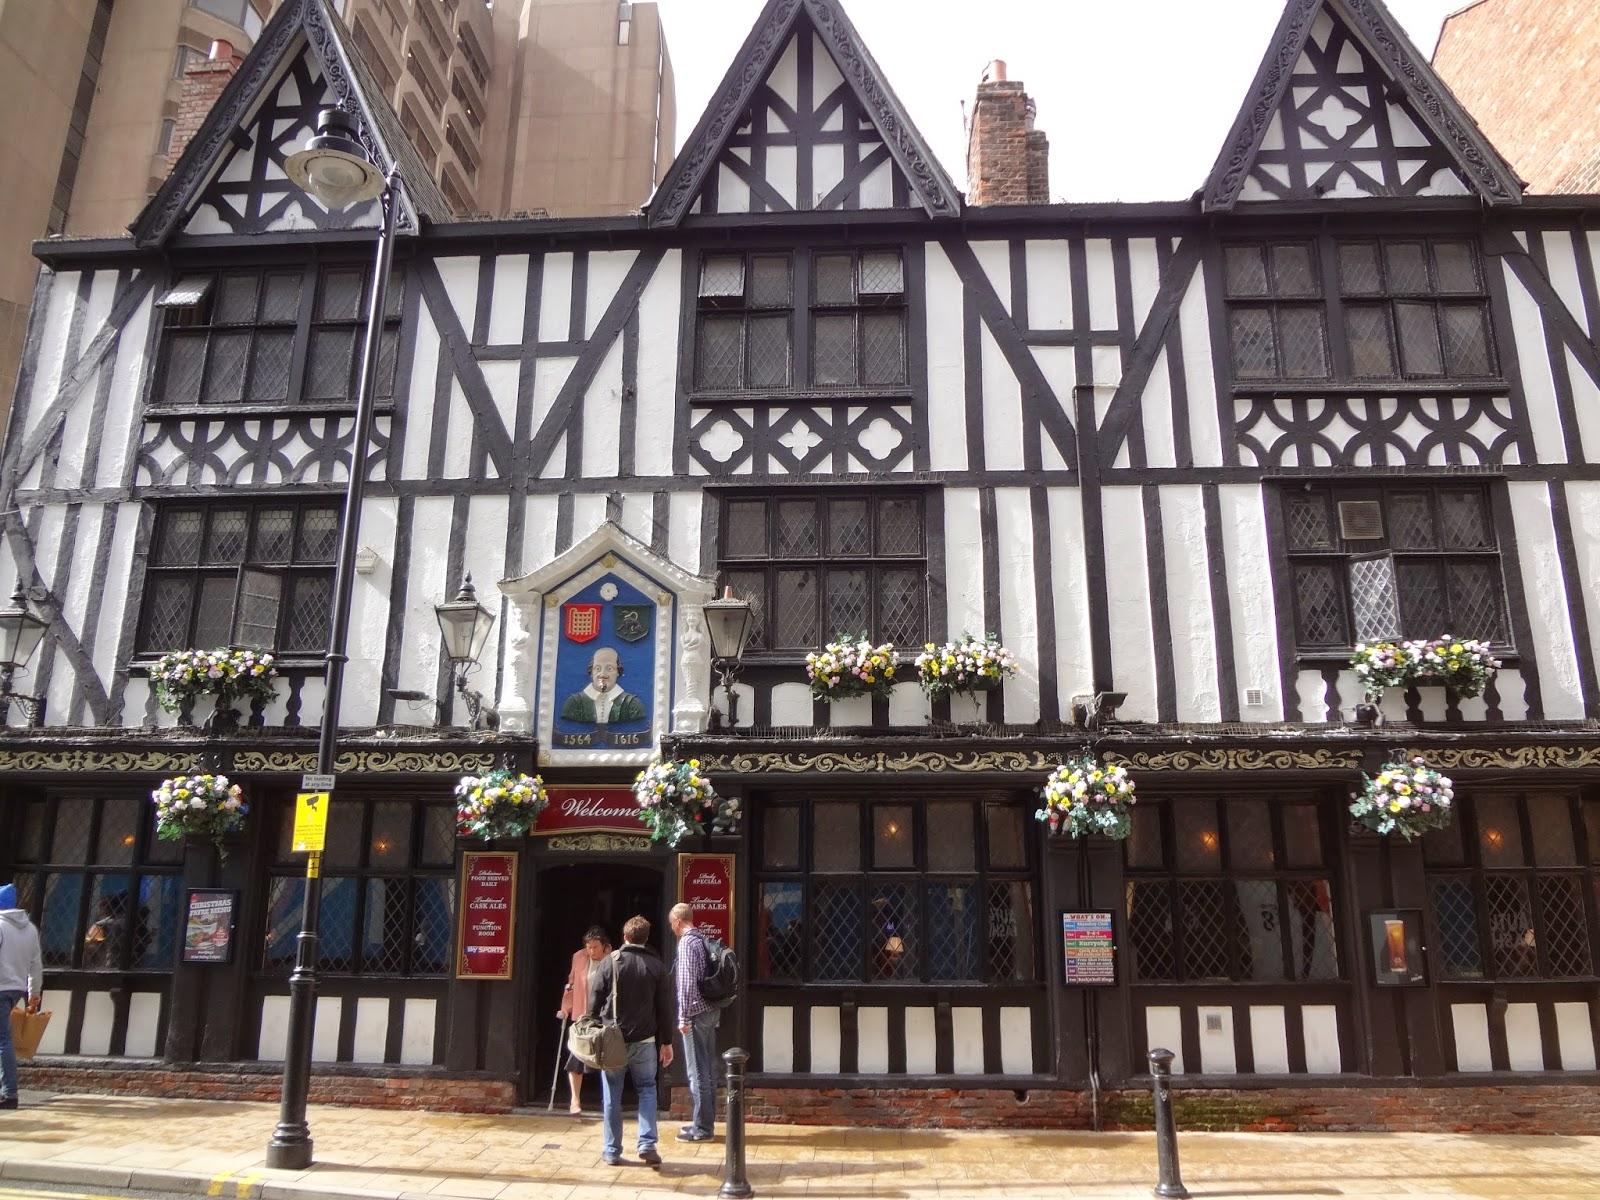 Old English Pub Manchester